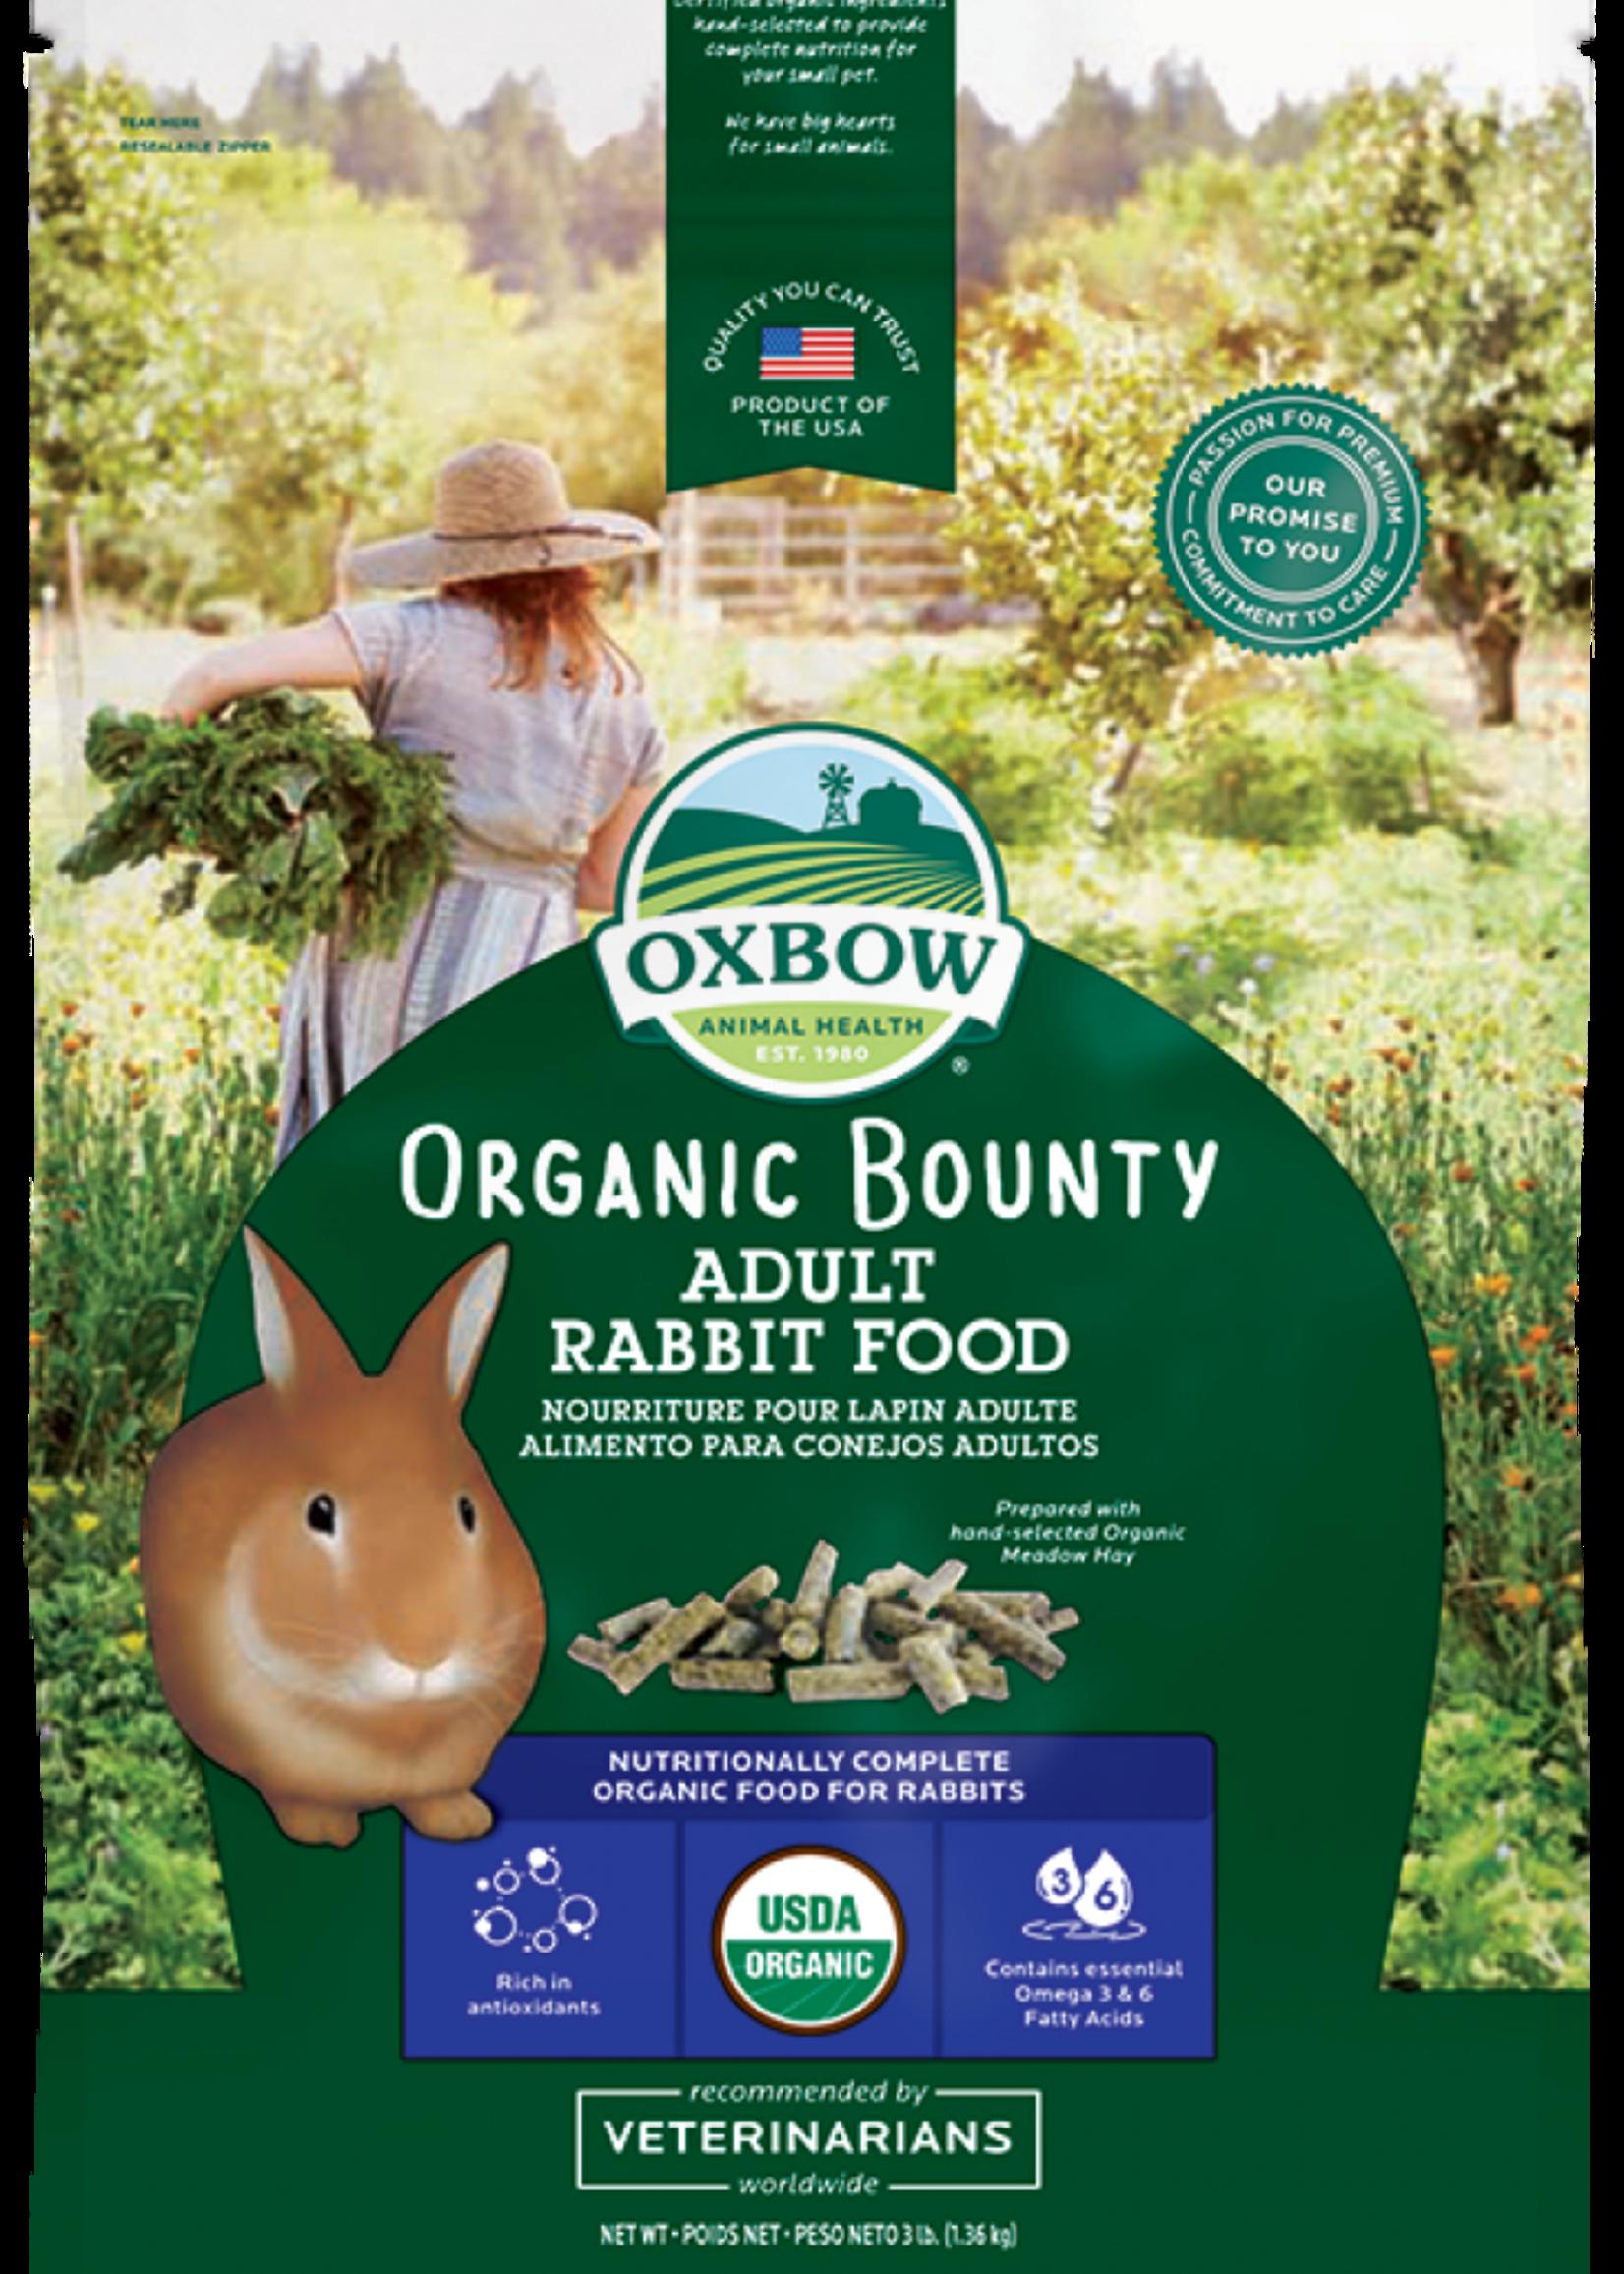 Oxbow Pet Products Organic Bounty Adult Rabbit Food 3 lb